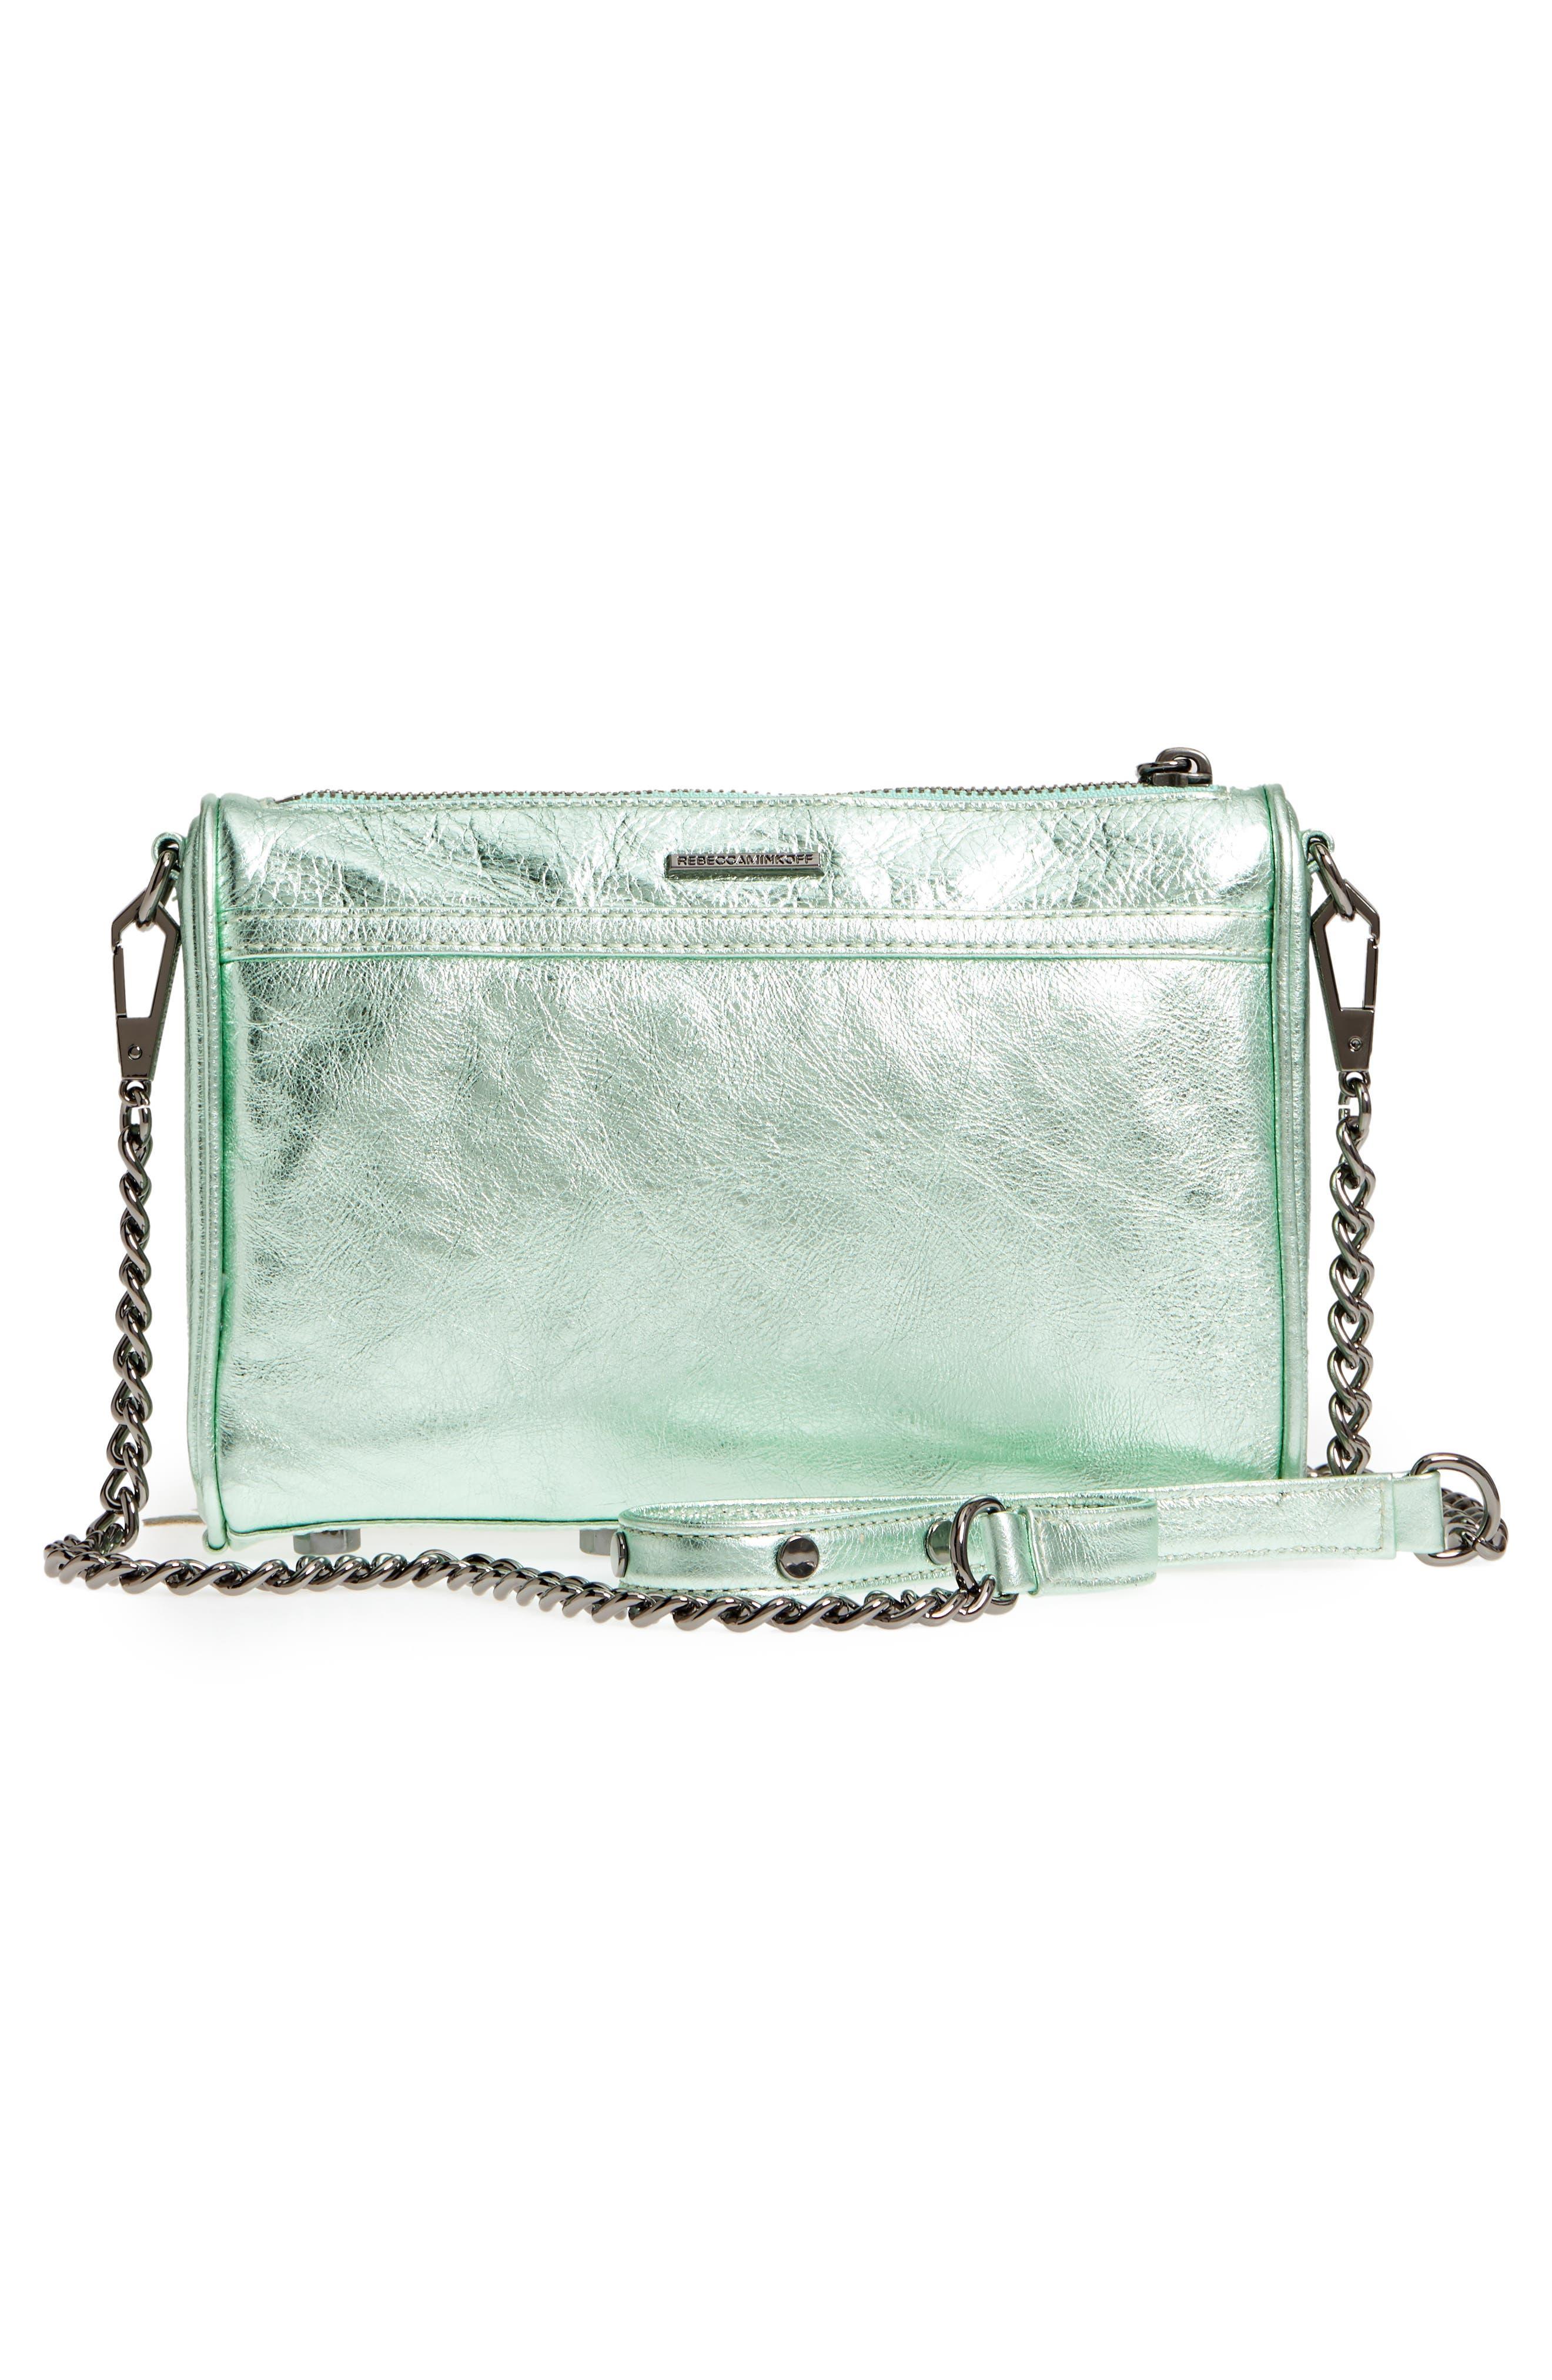 Mini MAC Metallic Leather Convertible Crossbody Bag,                             Alternate thumbnail 3, color,                             Mint